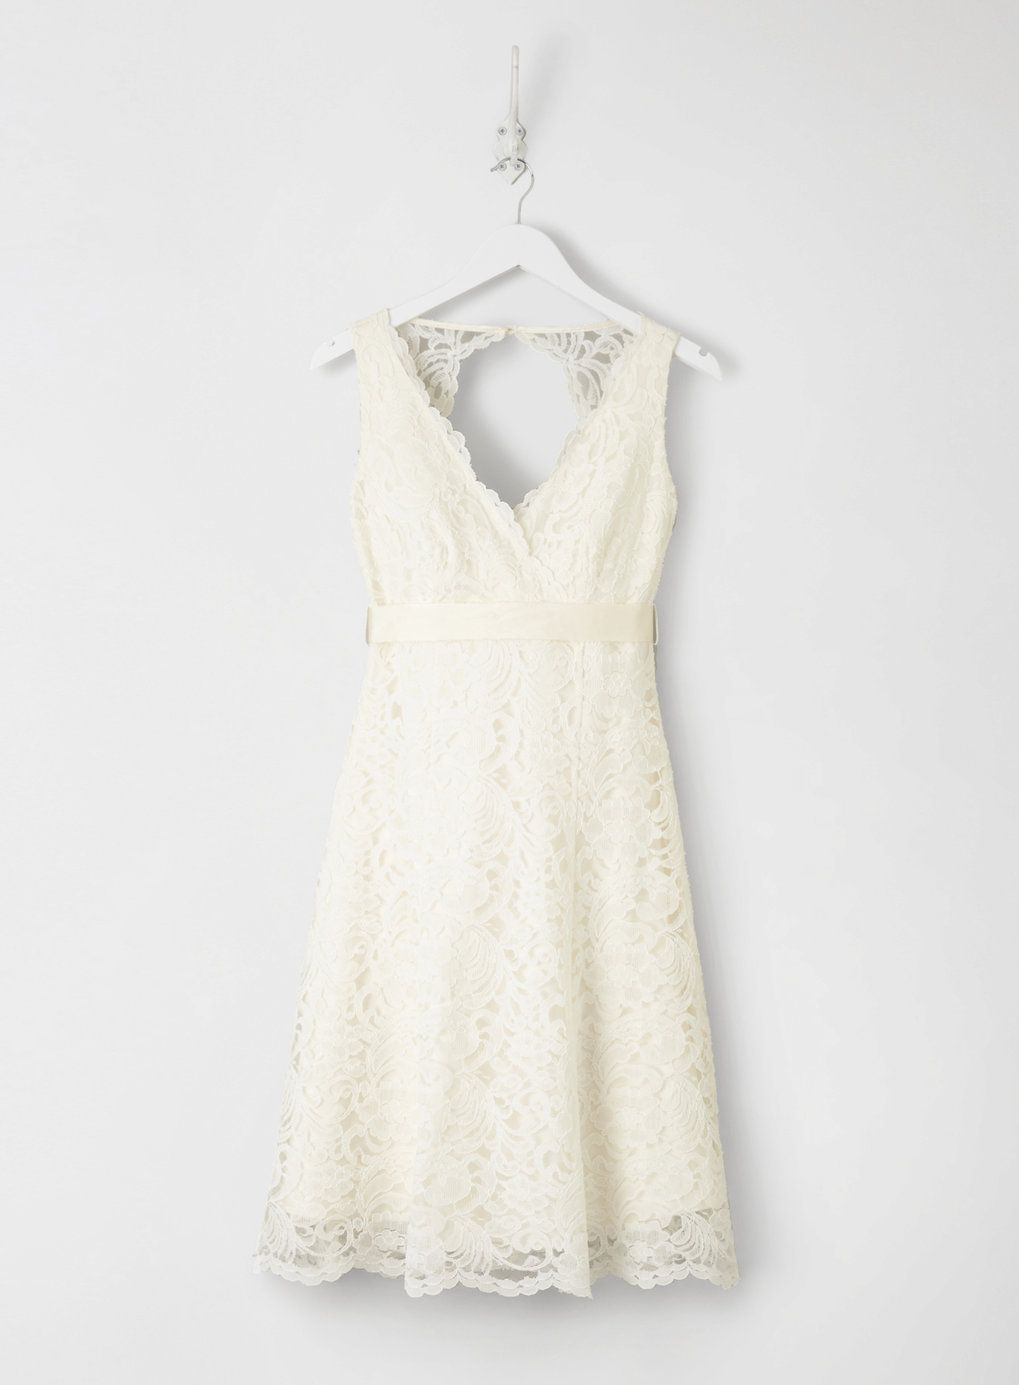 Ivory Bella Lace Short Bridal Dress Bhs Front Knee Length Wedding Dress Short Bridal Dress Wedding Dress Long Sleeve